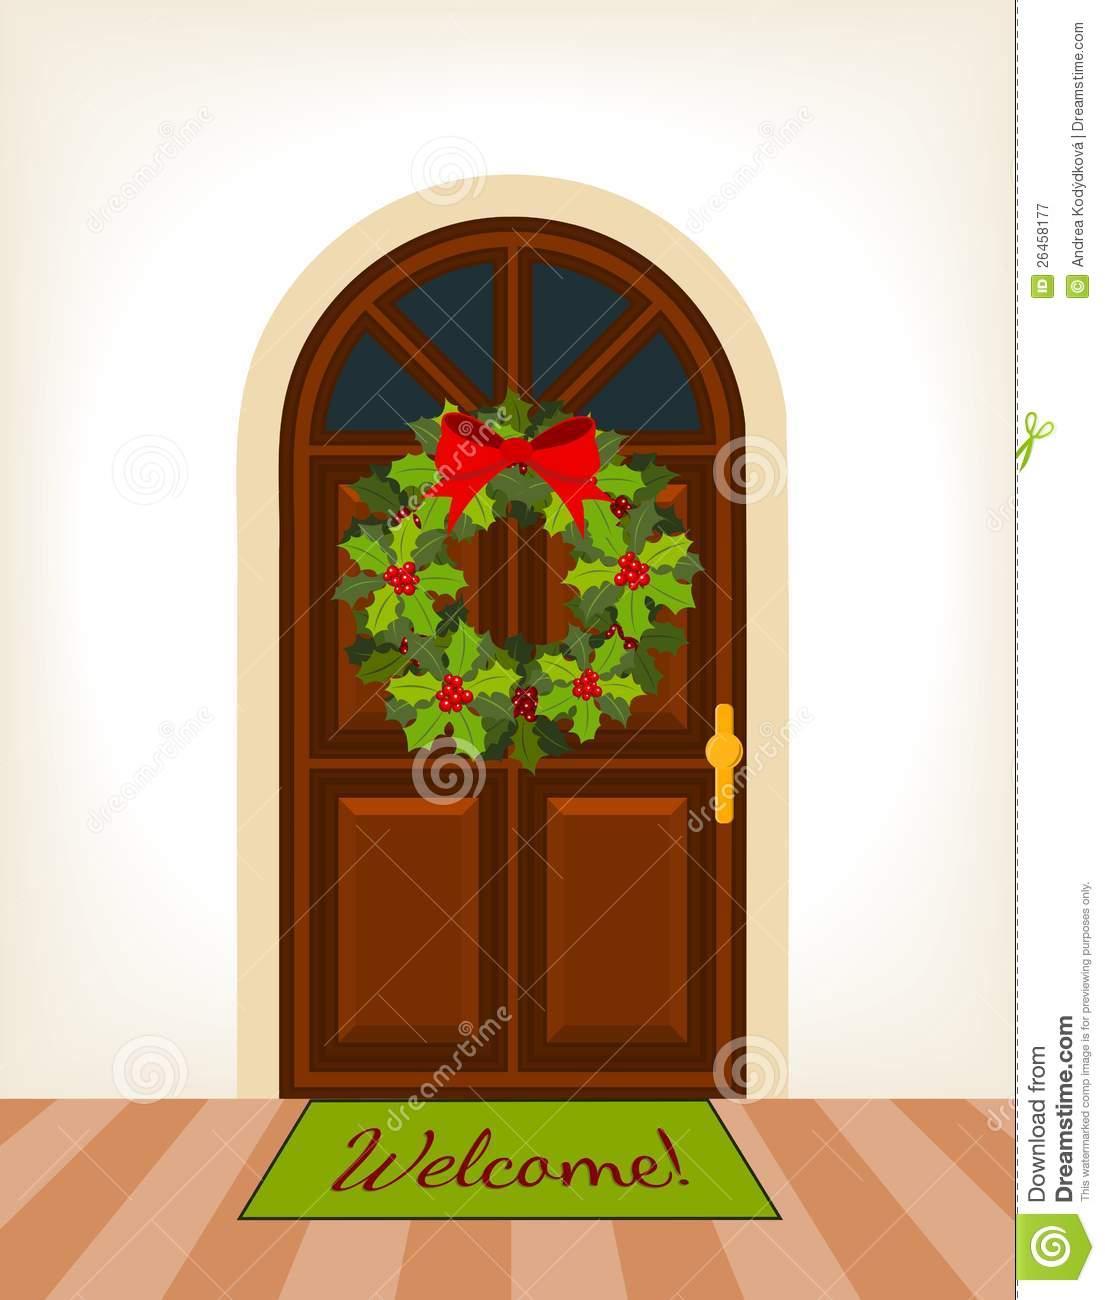 Door 1 clipart png freeuse Christmas clip art door - 15 clip arts for free download on EEN png freeuse